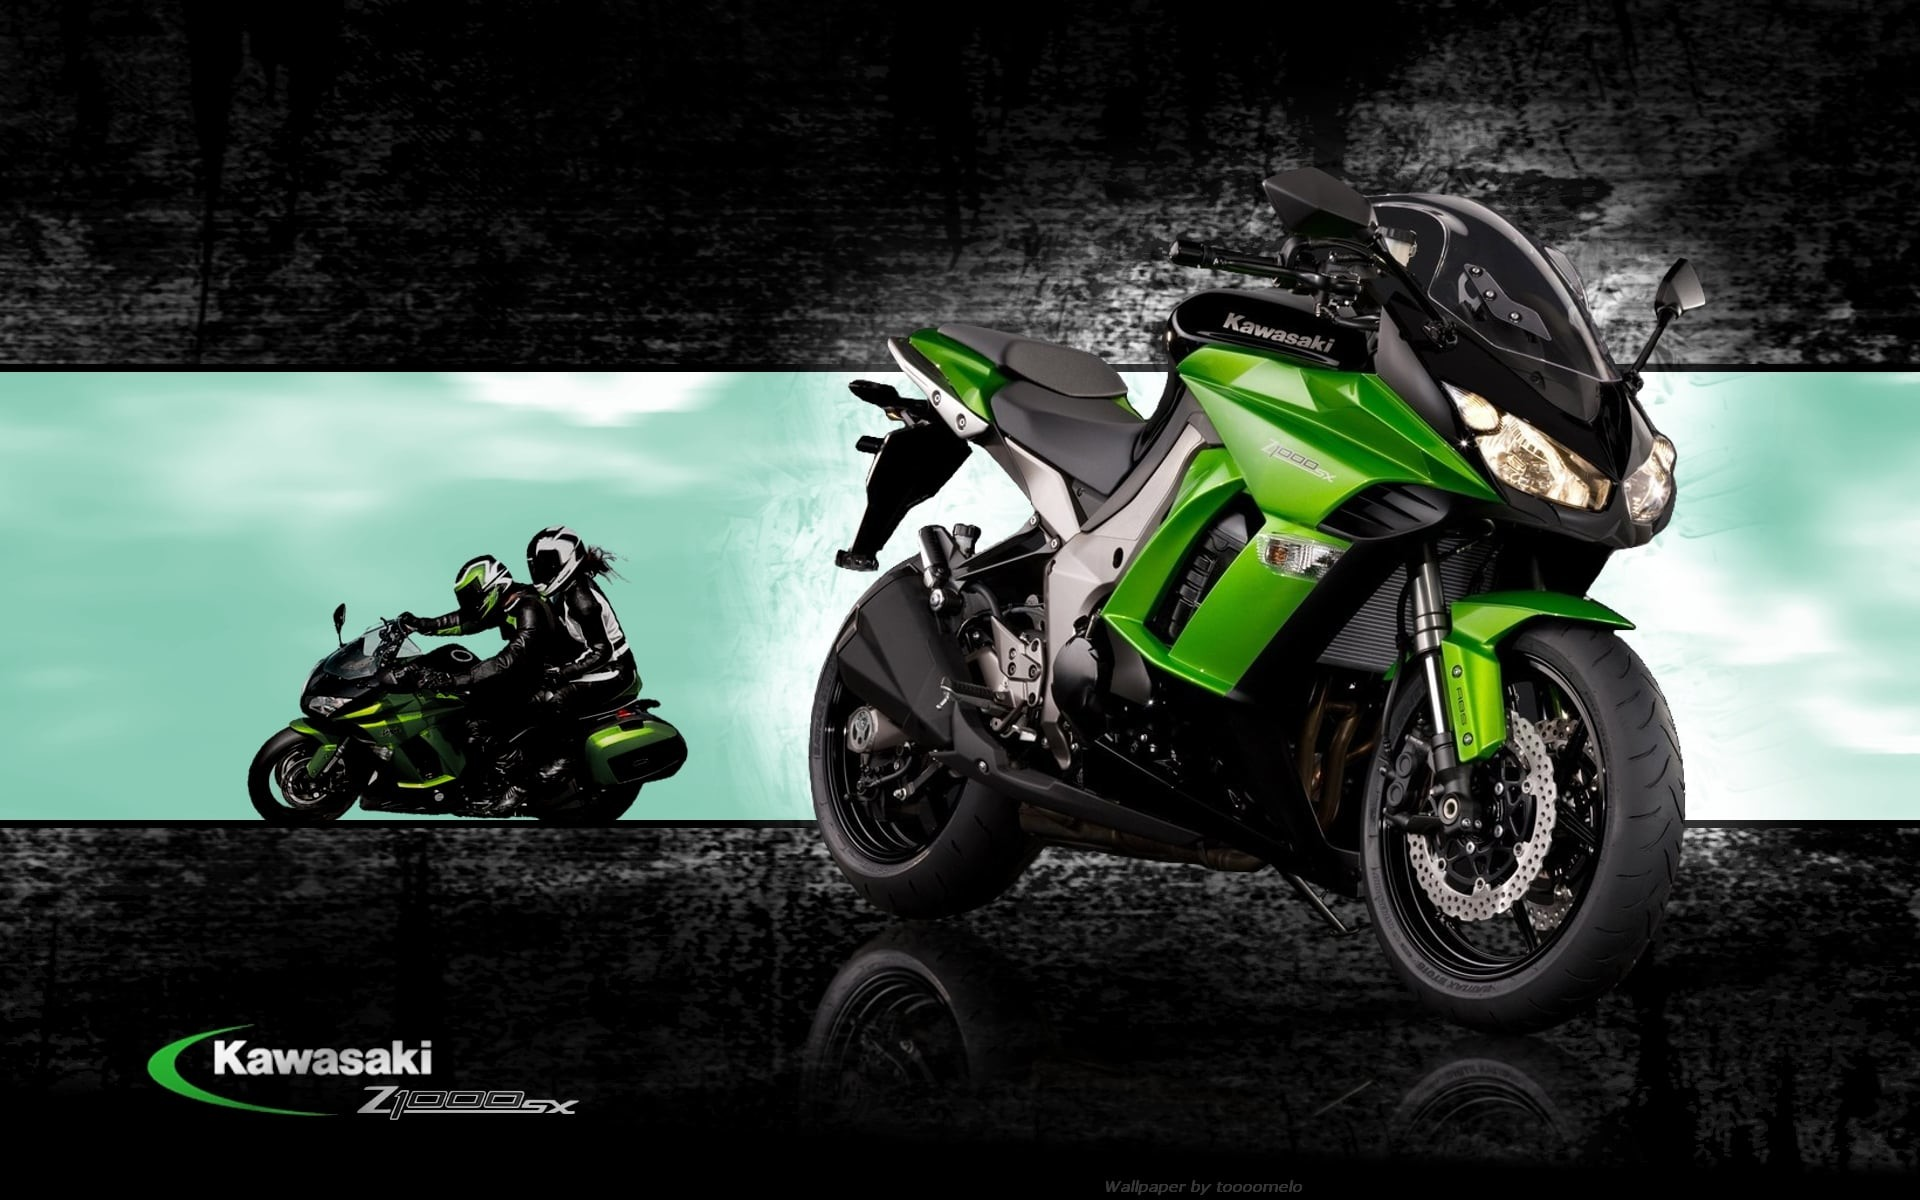 Kawasaki Z1000sx 2018 Wallpaper (73+ Images